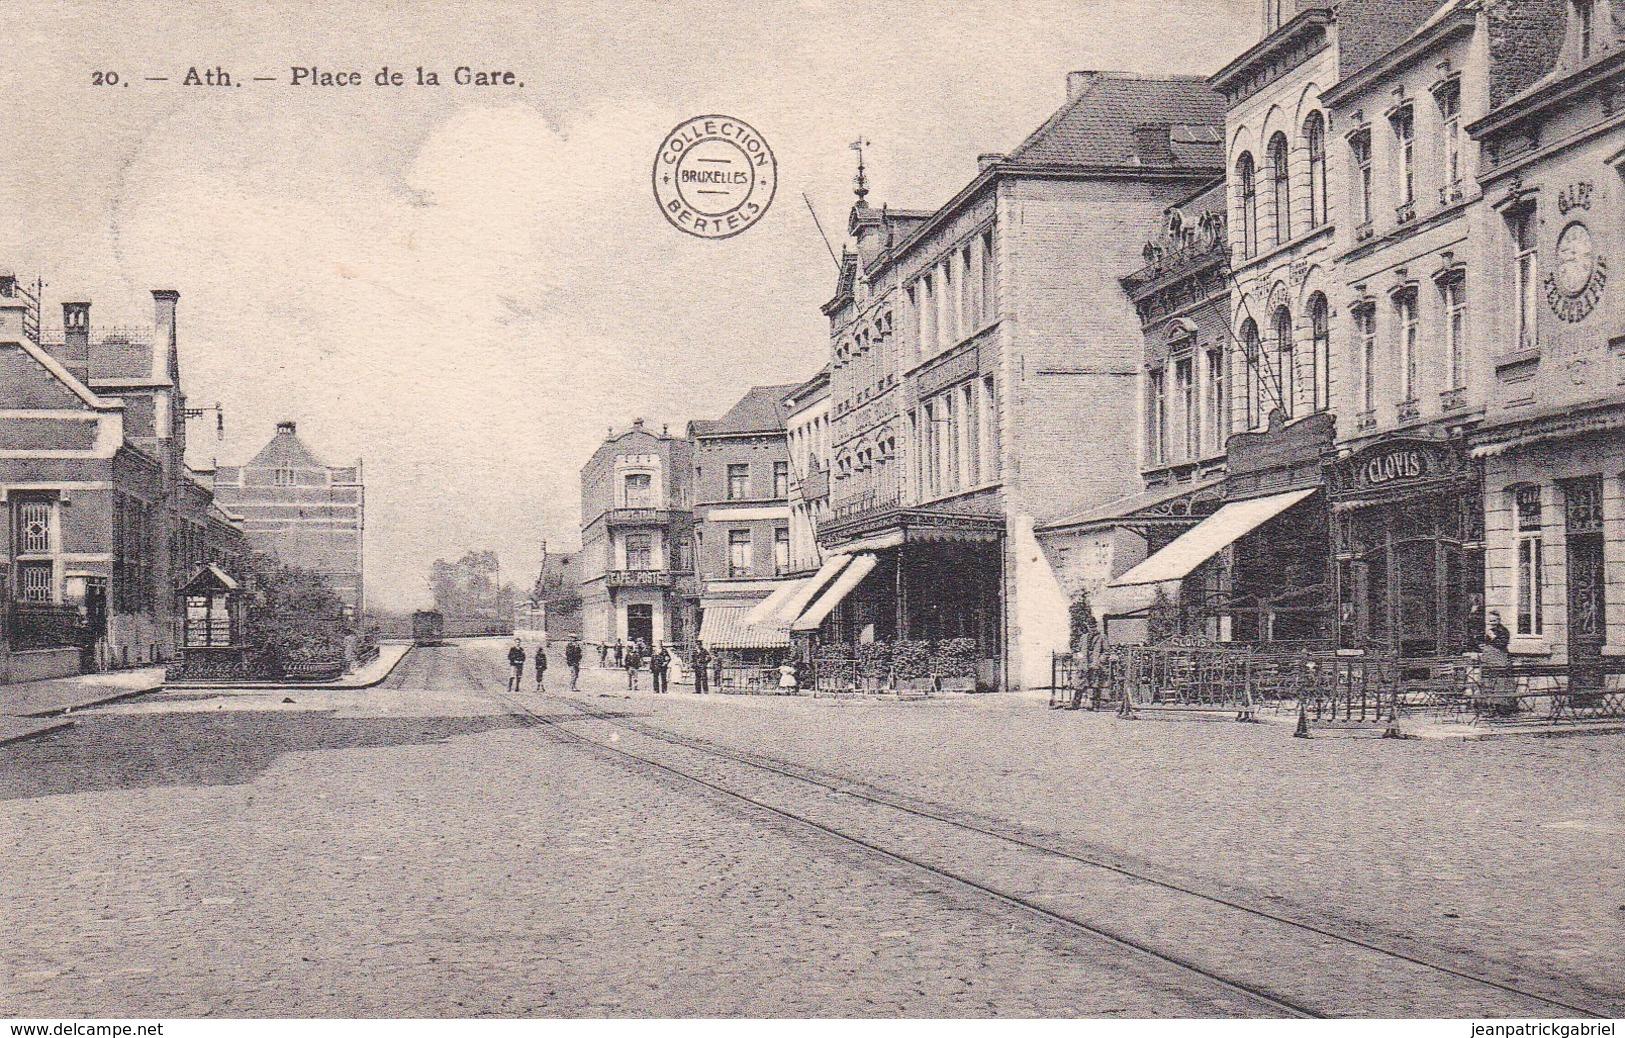 619 Ath Place De La Gare - Ath